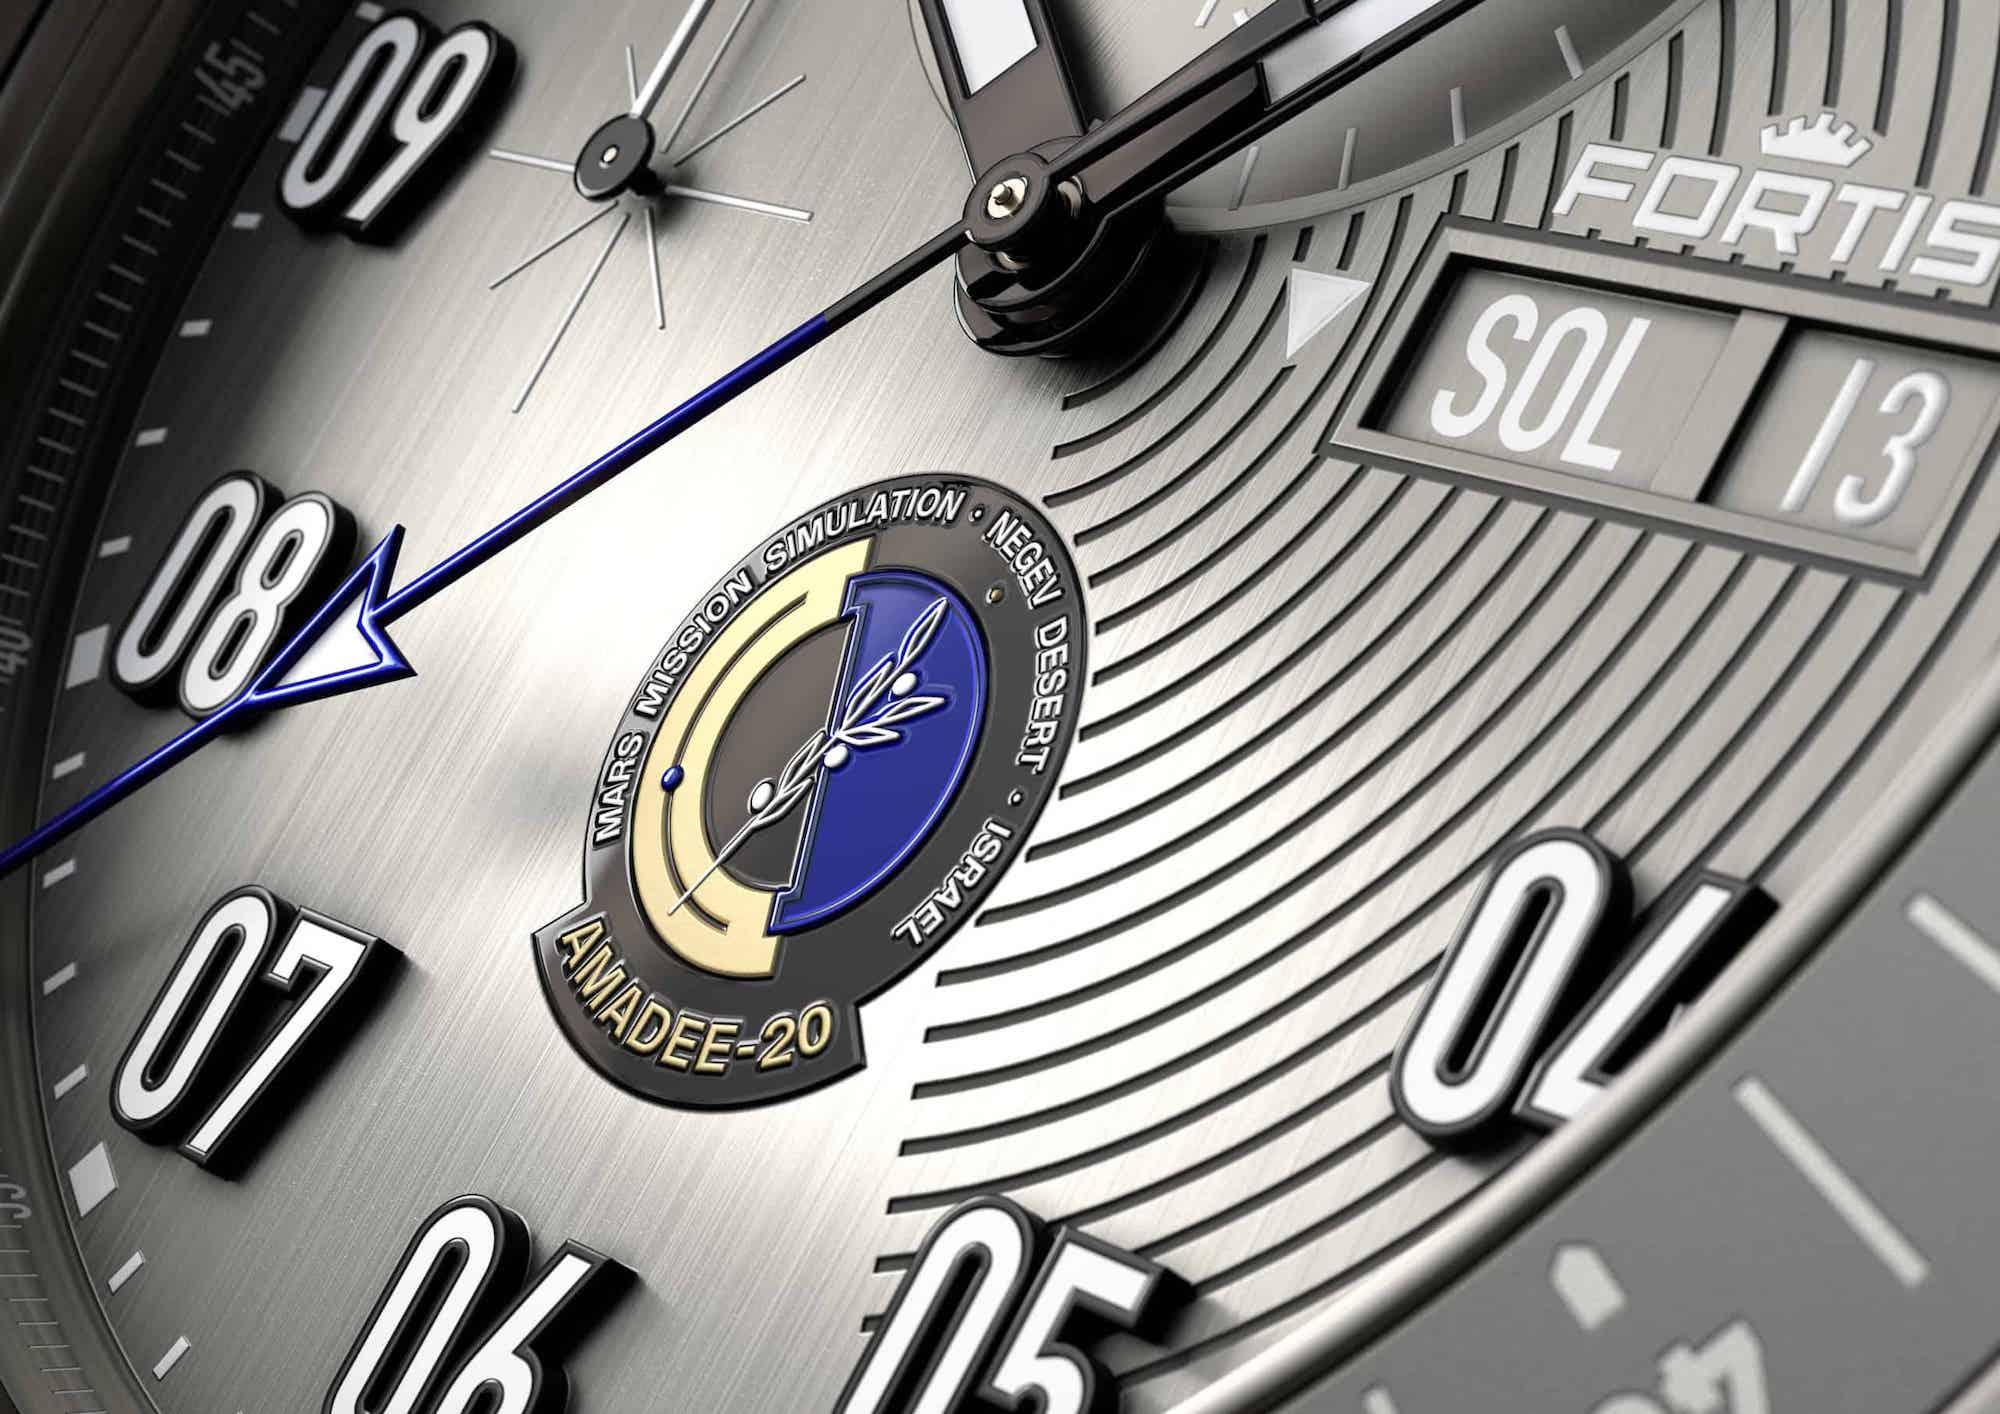 Fortis Official Cosmonauts Chronograph AMADEE-20 Detalle esfera